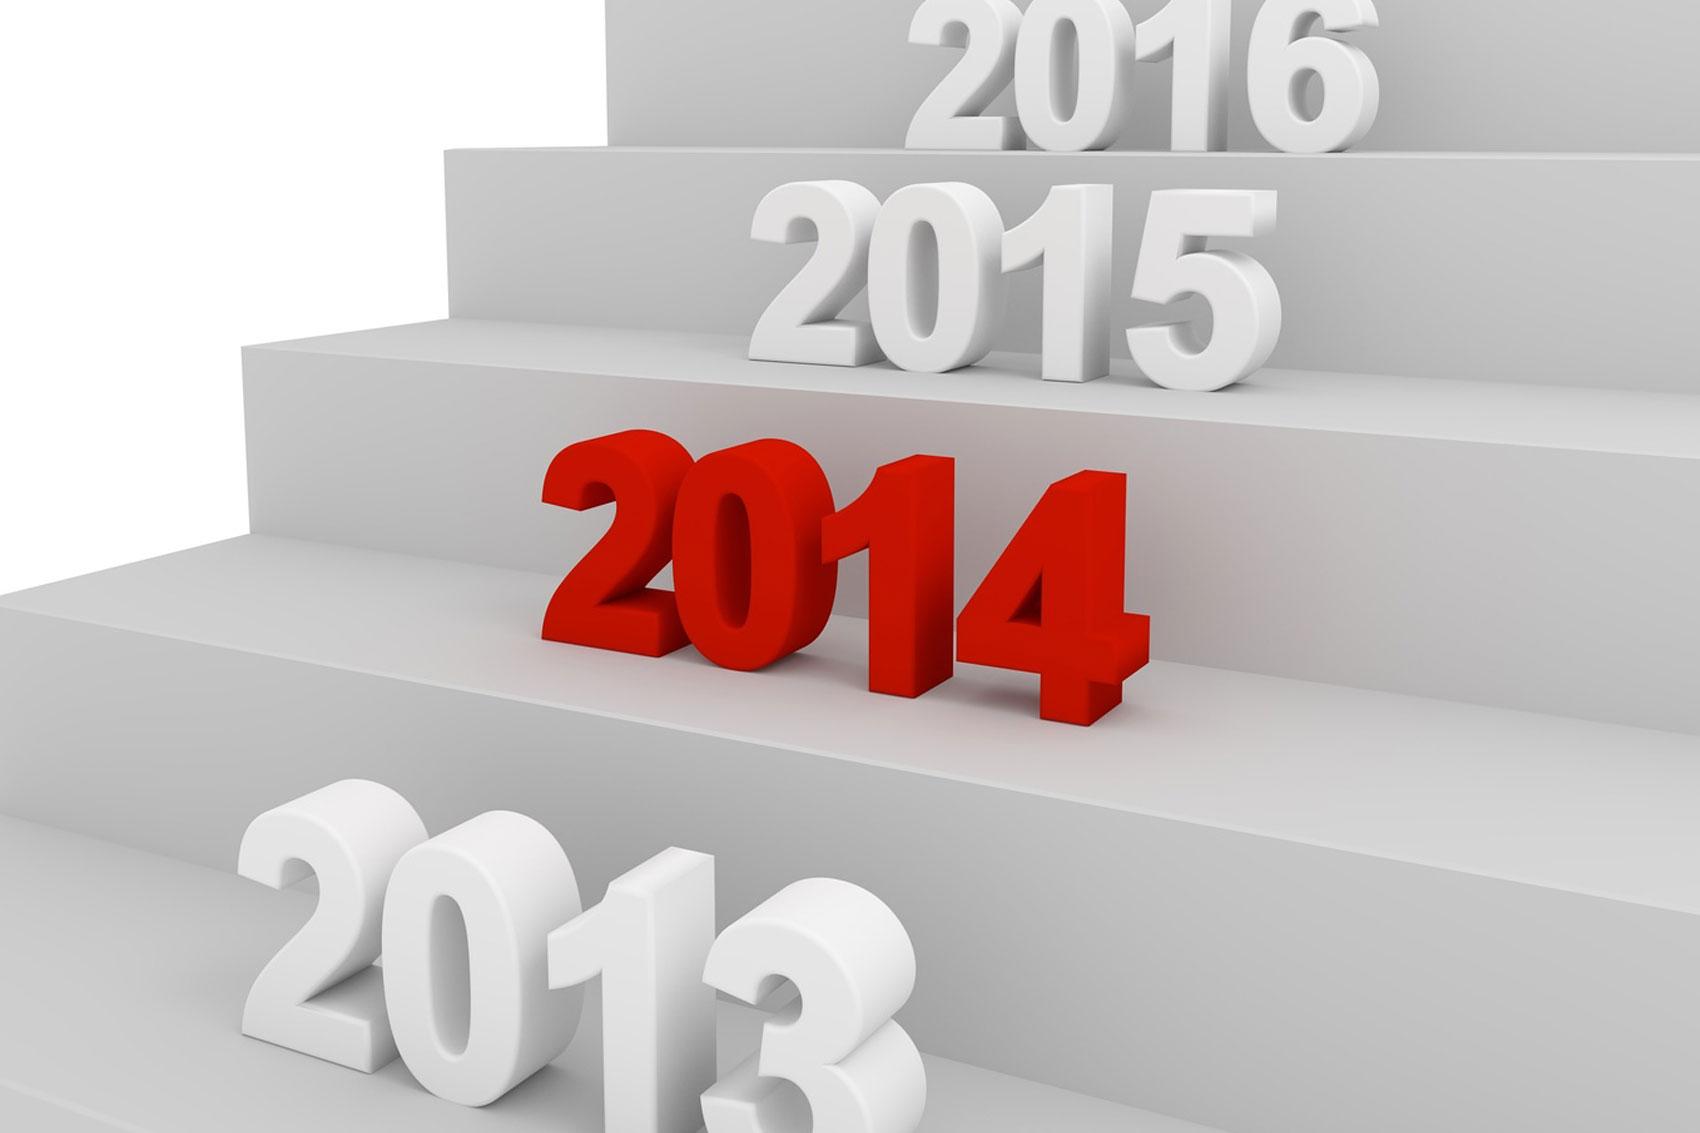 Celebrating a decade of service; a momentous journey for Net Platforms.